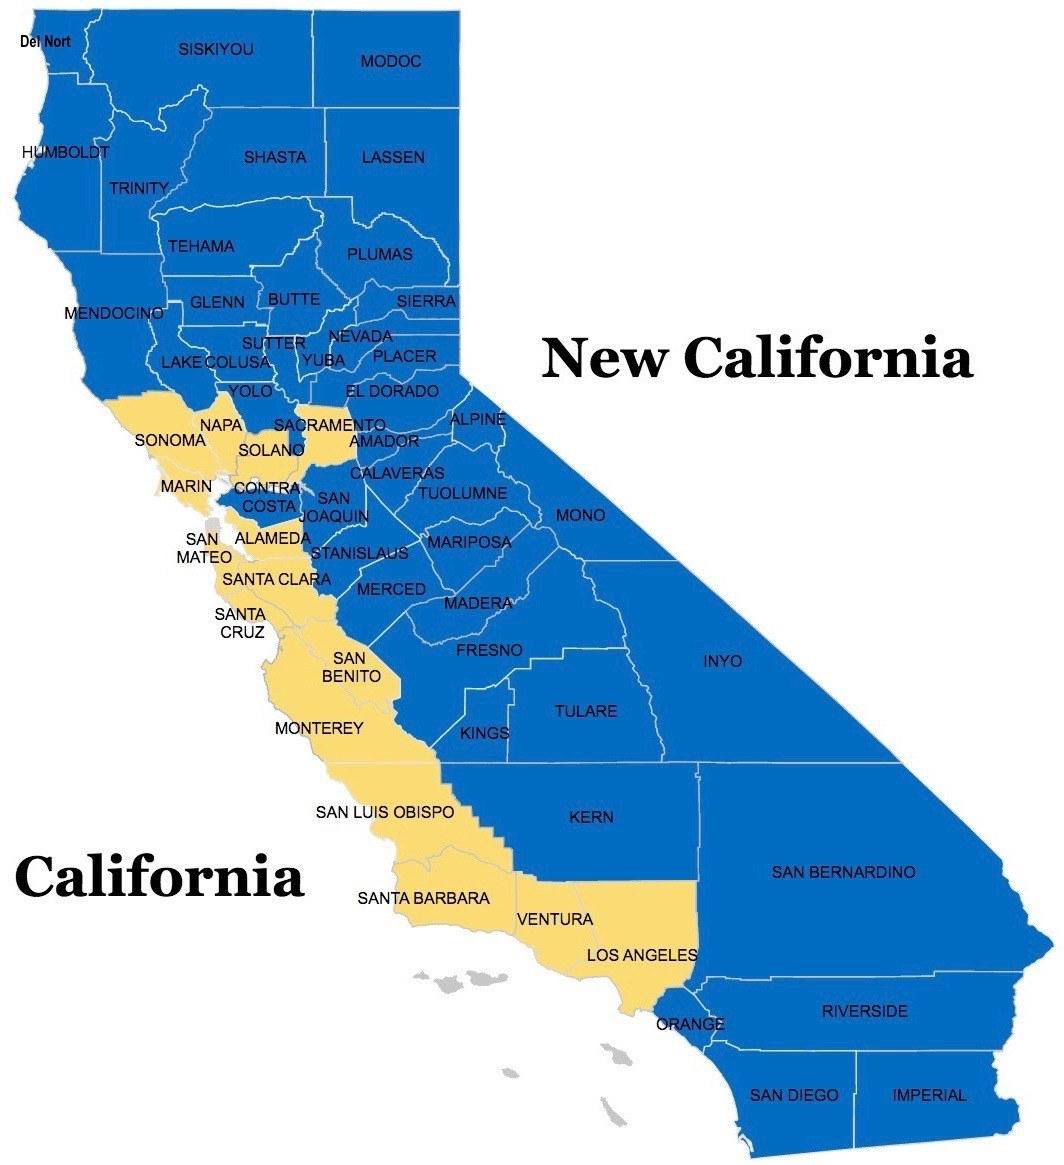 New California Map